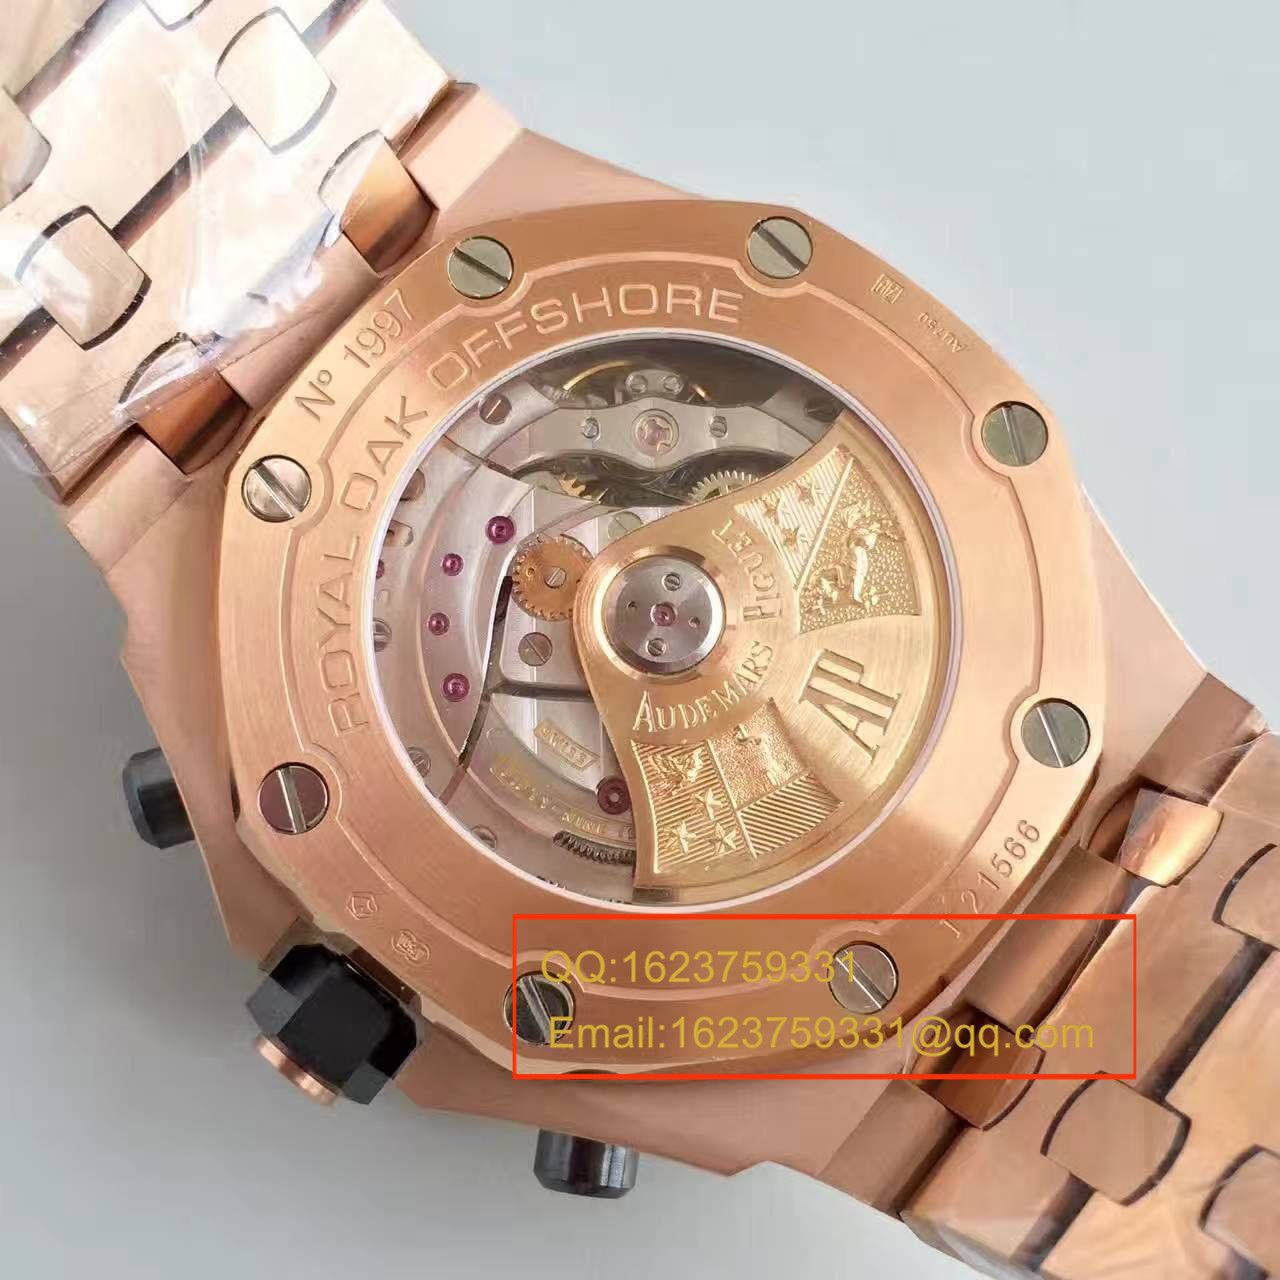 【JF厂一比一精仿】爱彼皇家橡树离岸型系列26470OR.OO.1000OR.01腕表 / AP002